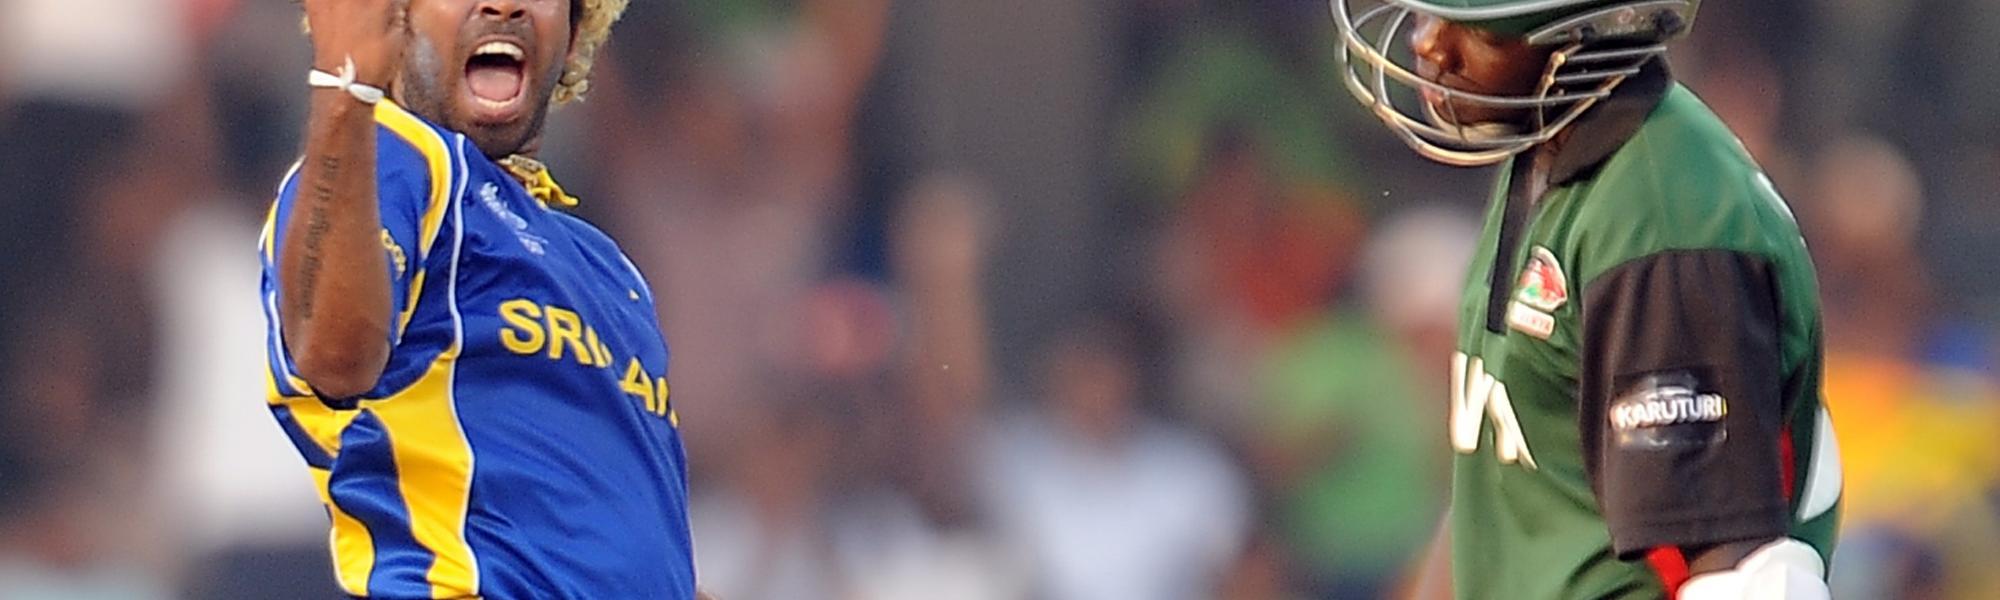 ICC Cricket World Cup hat-tricks